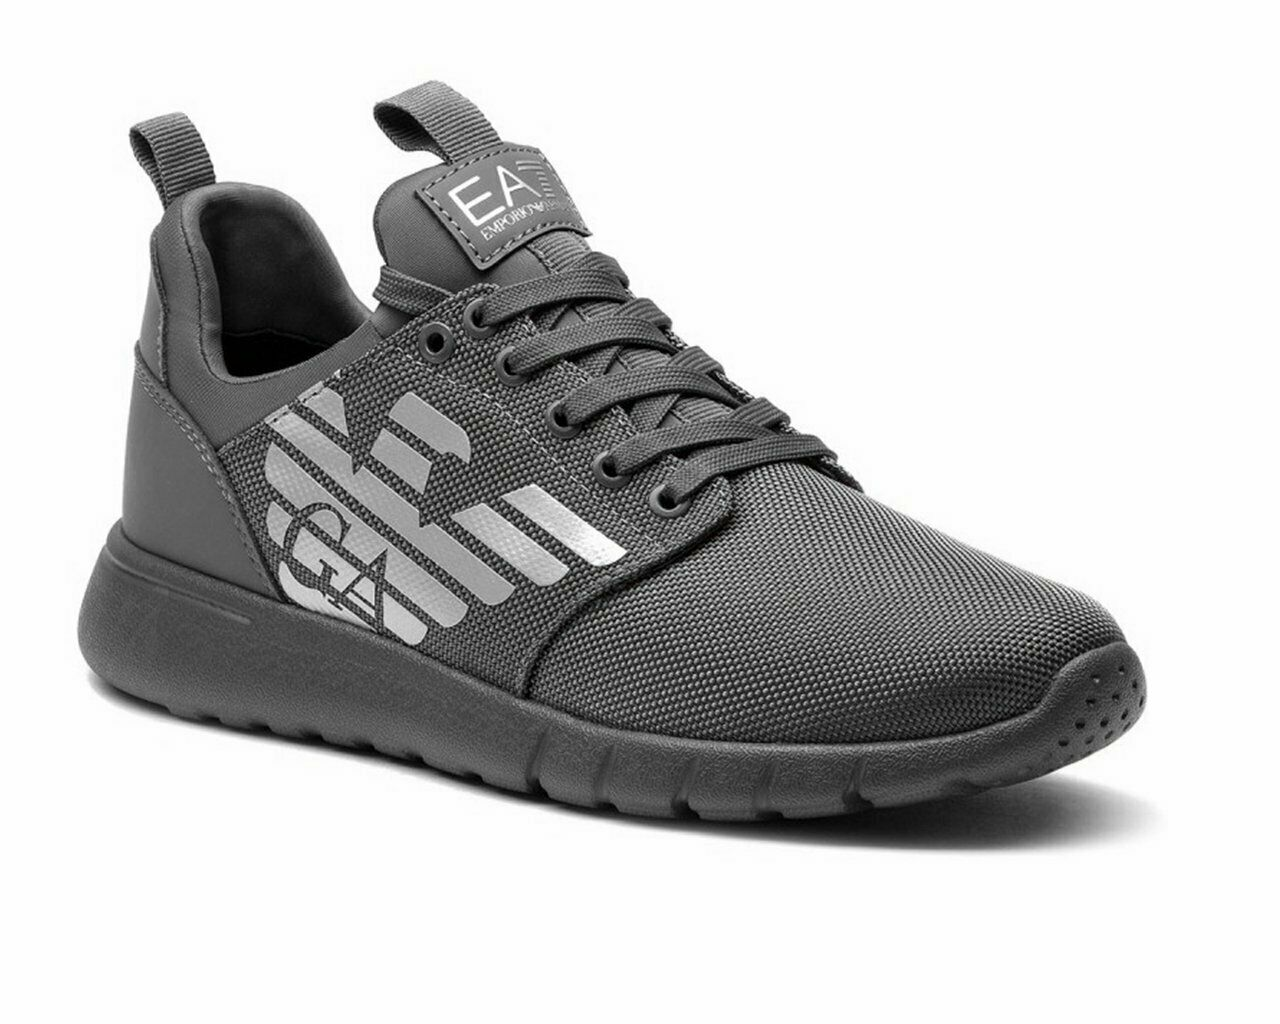 Emporio Armani Sneakers X8X008 XK008 EA7 Trainers Grey